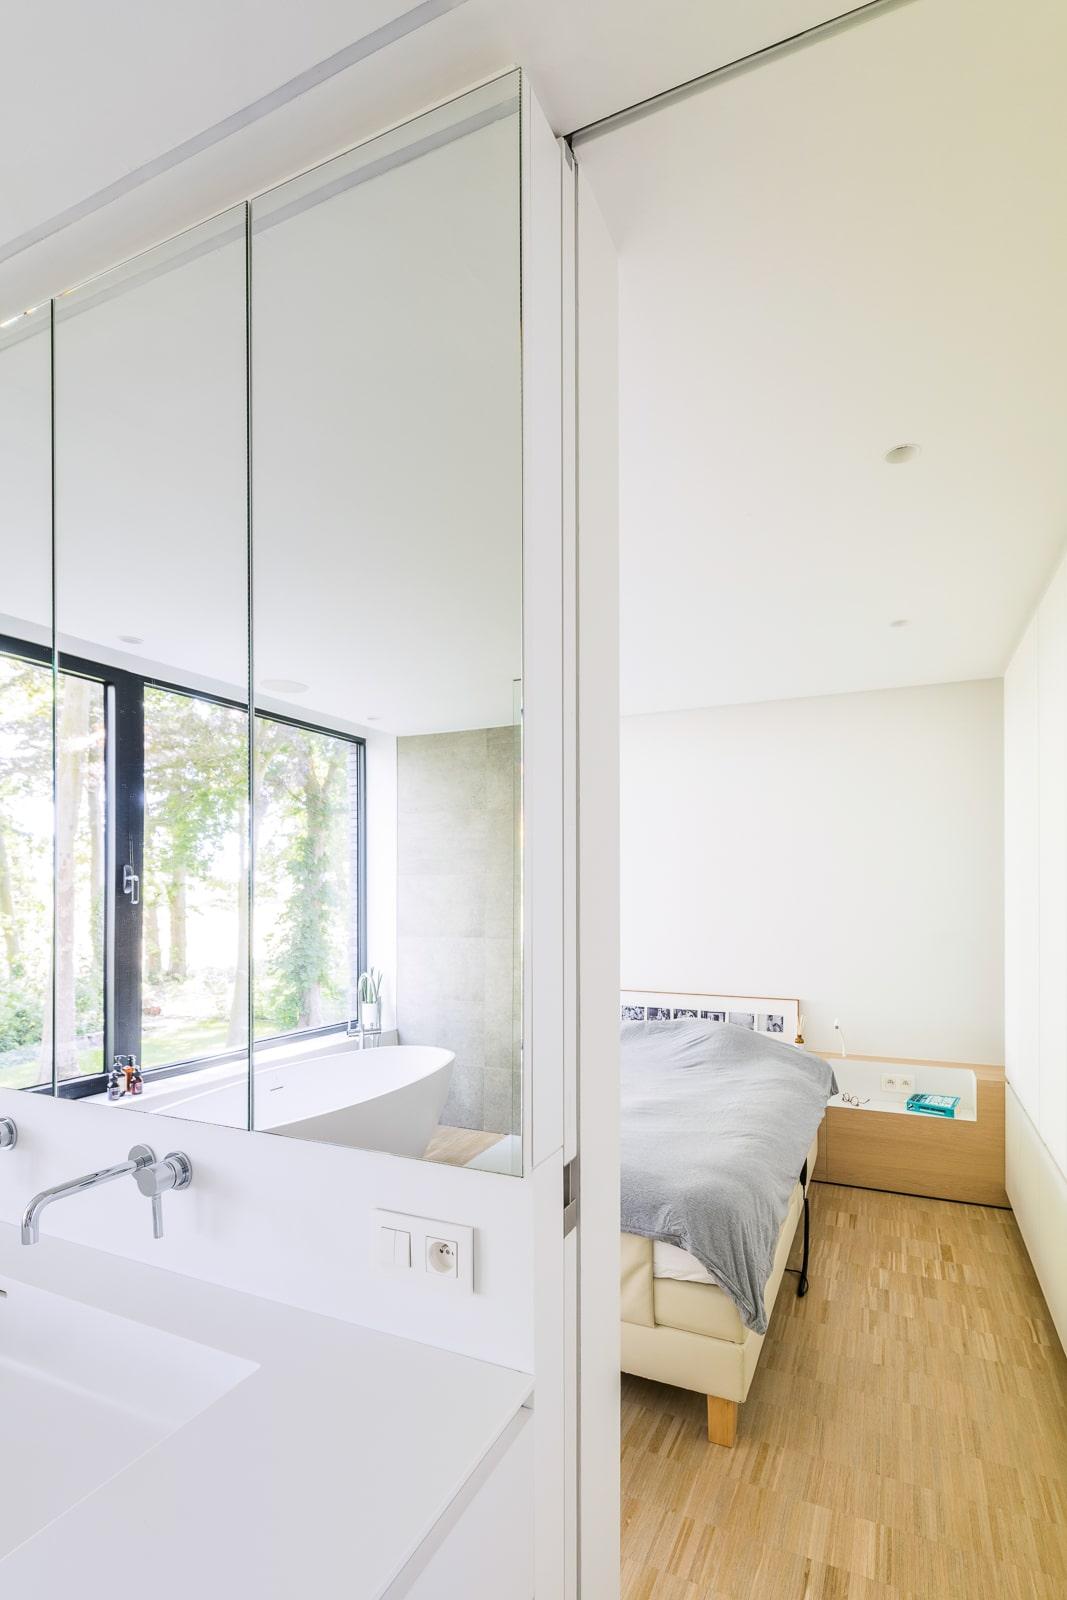 BaeyensBeck Kjell 062web | Baeyens & Beck architecten Gent | architect nieuwbouw renovatie interieur | high end | architectenbureau